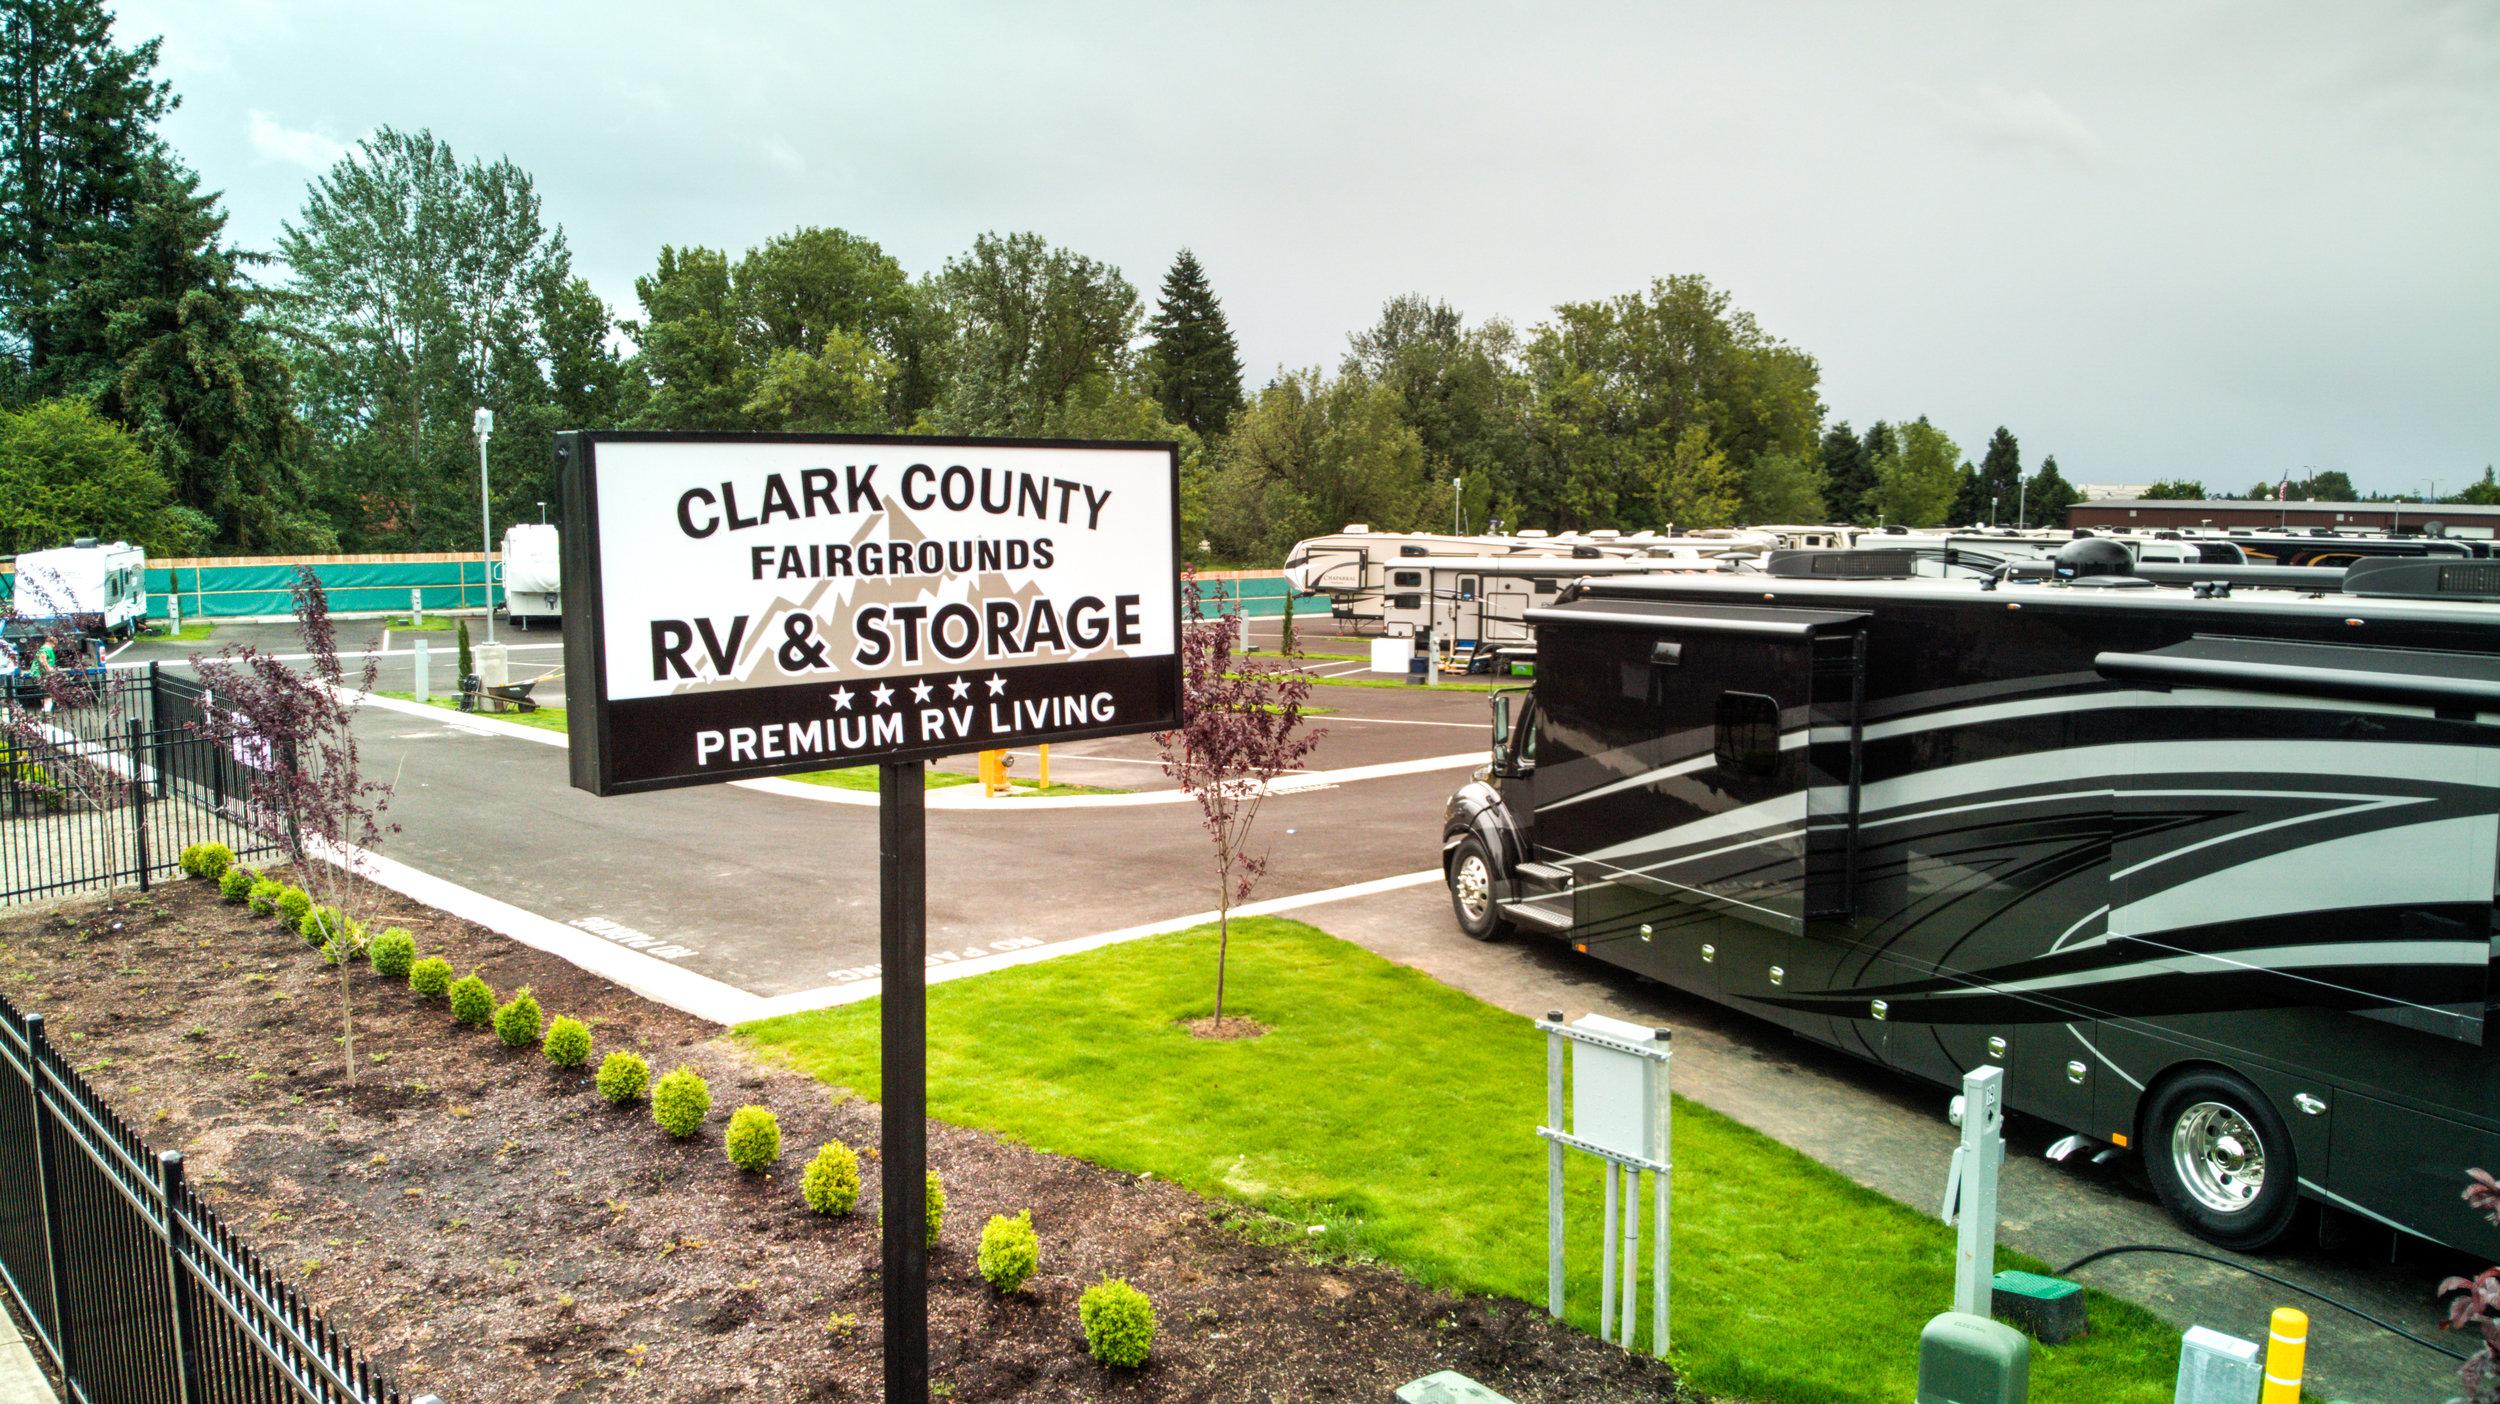 Clark county fairgrounds rv park and storage.jpg